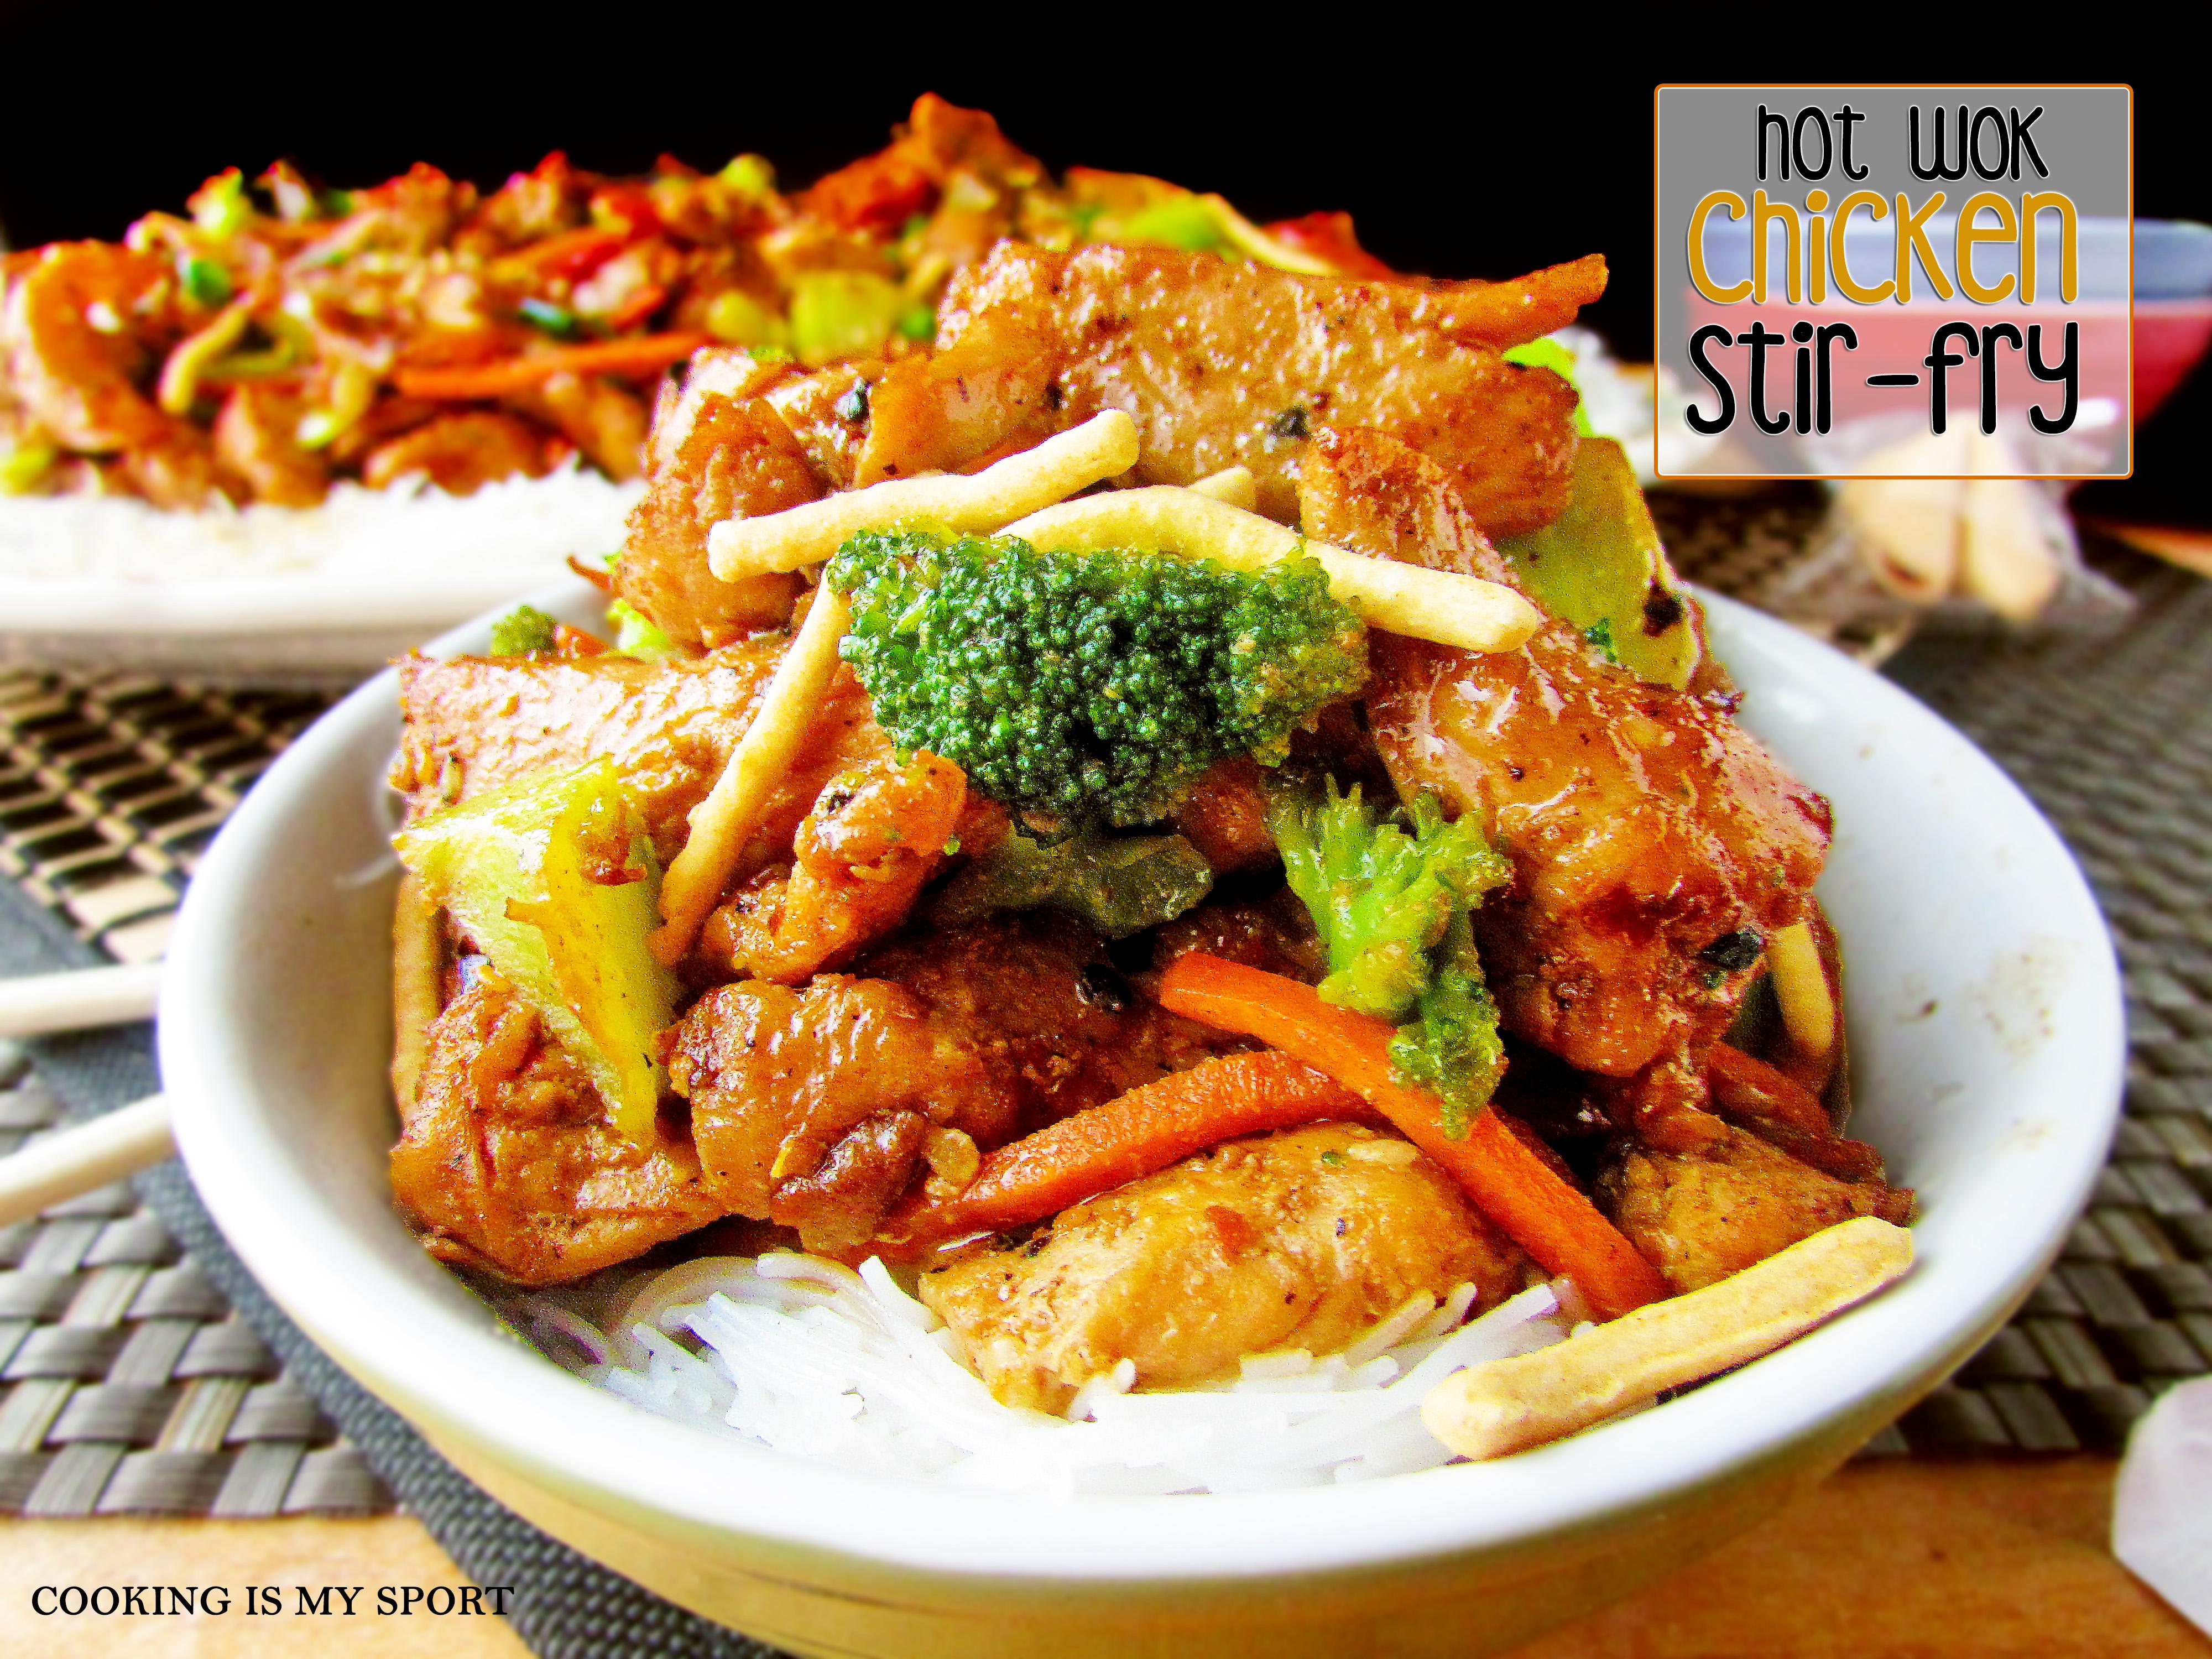 Hot Wok Chinese Food Food